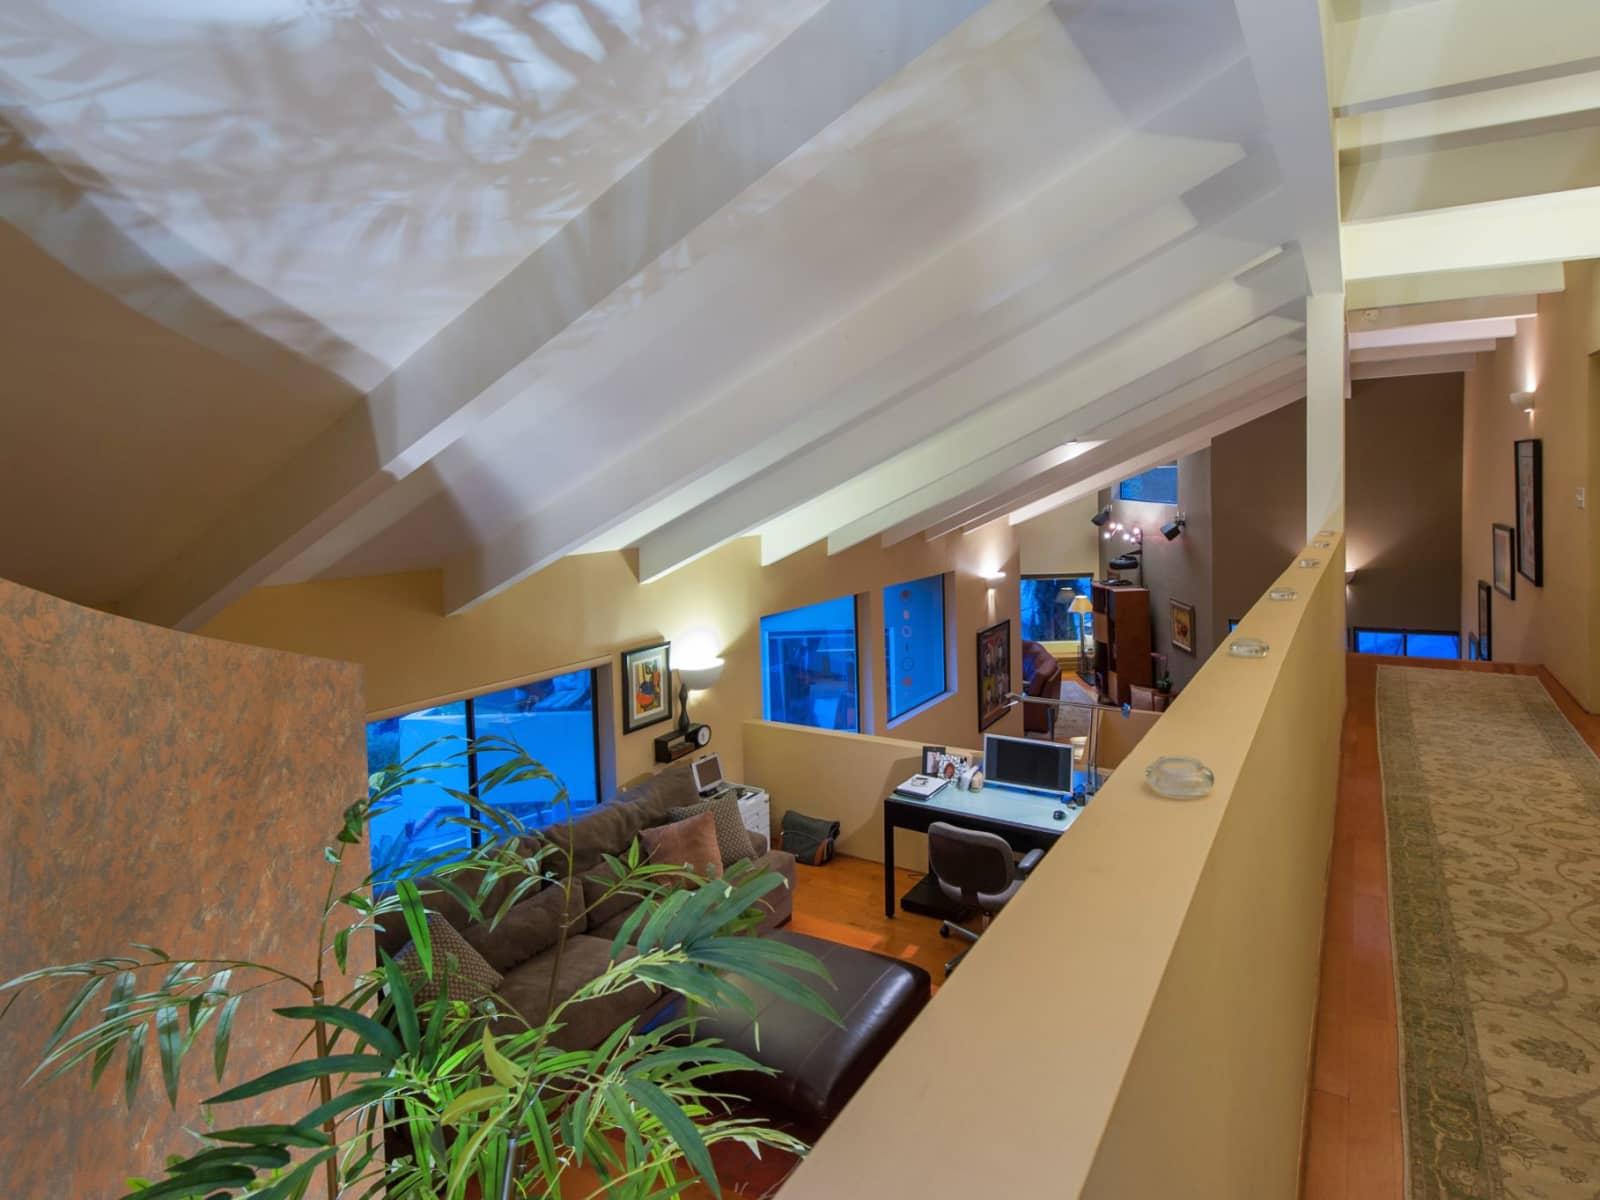 House Sitting Oxnard California Find Jobs Sitters Housesitter